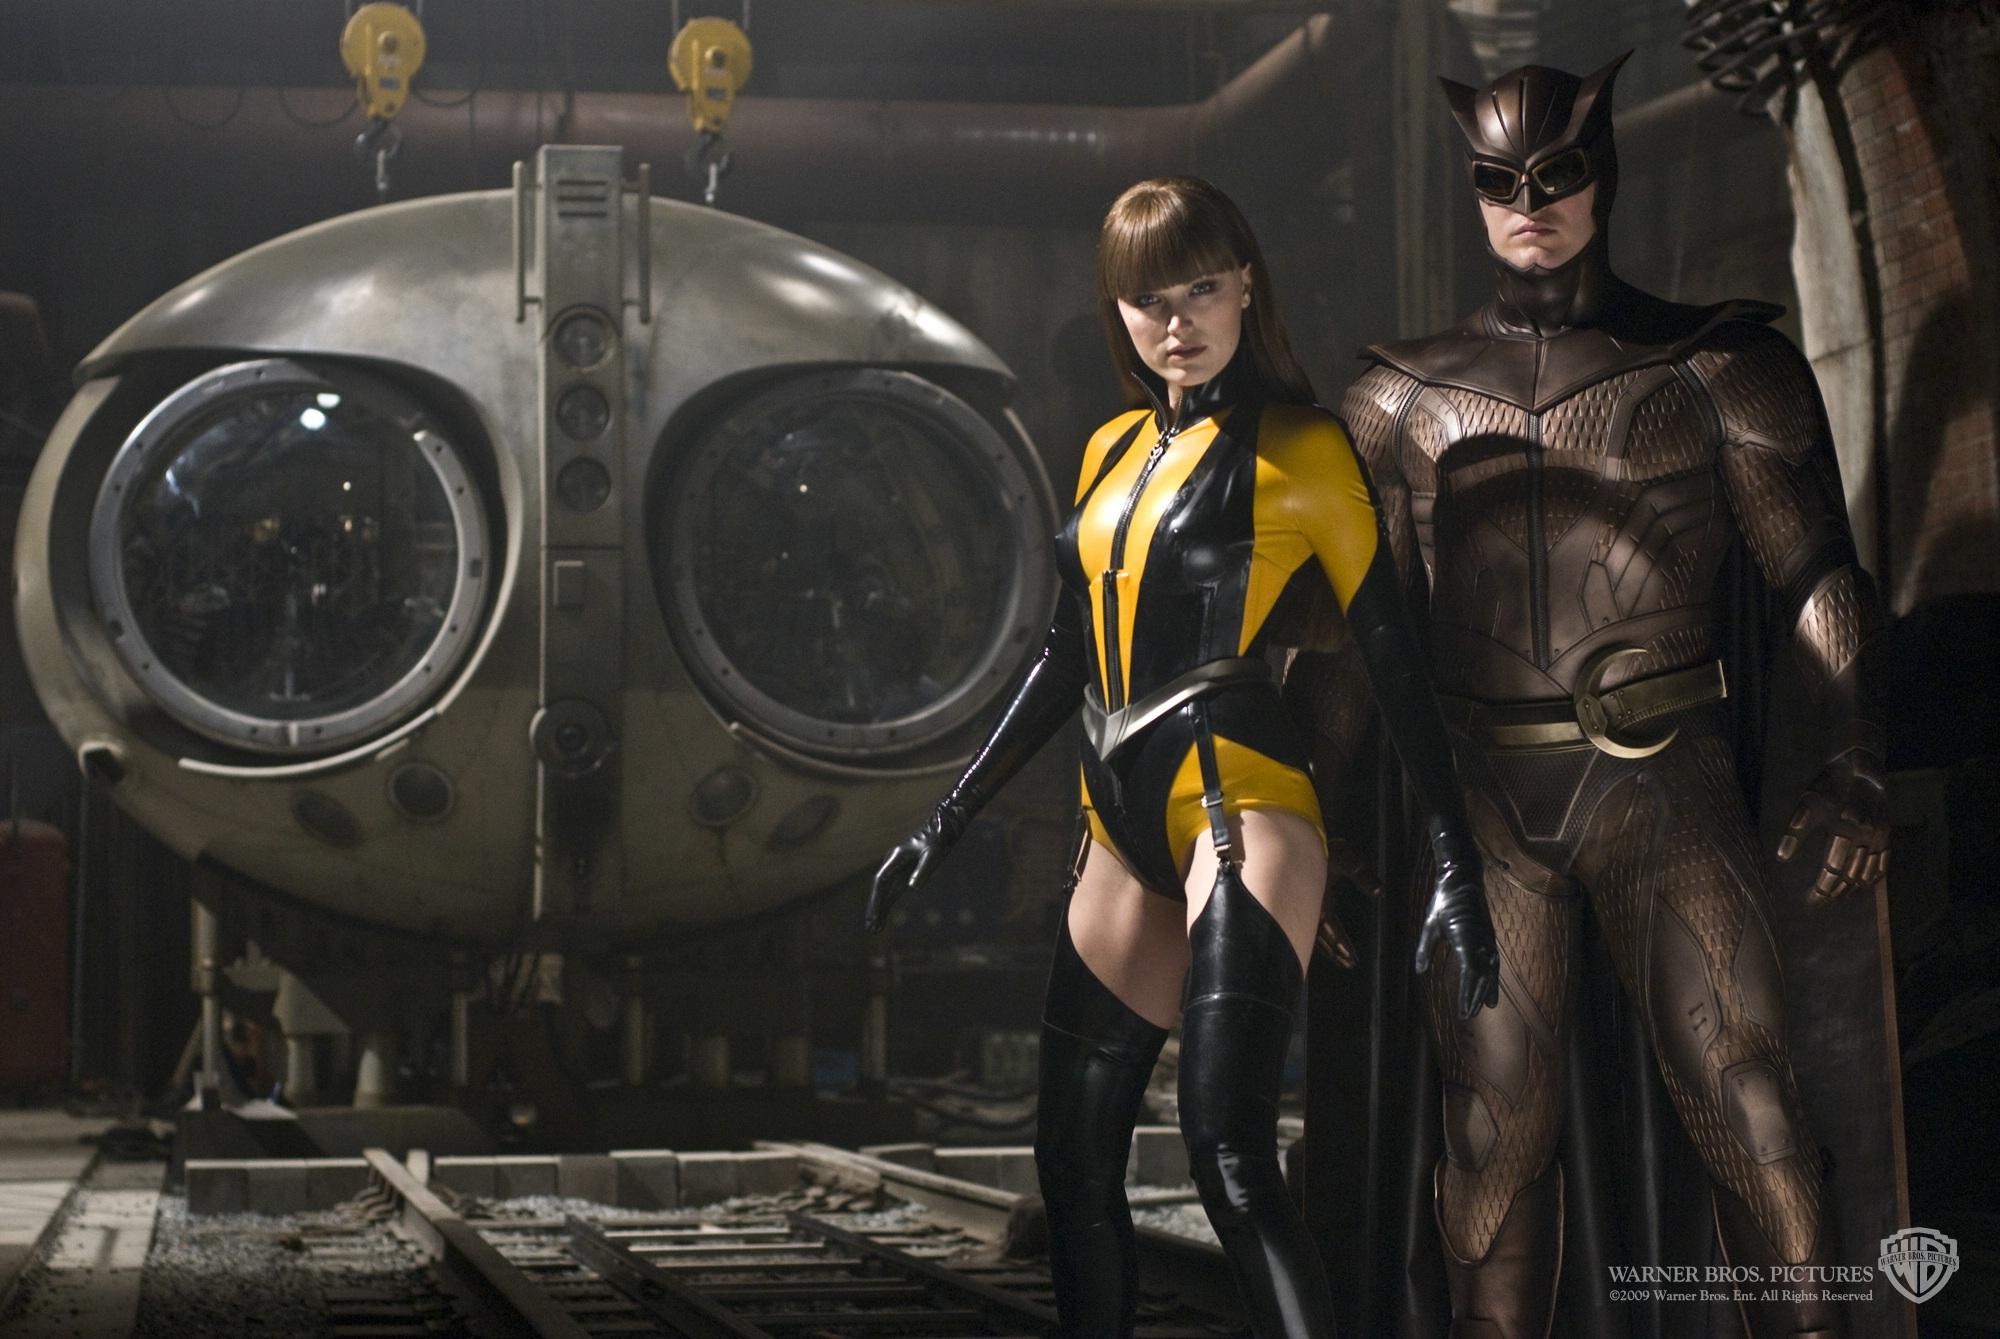 Watchmen silk spectre and night owl scene